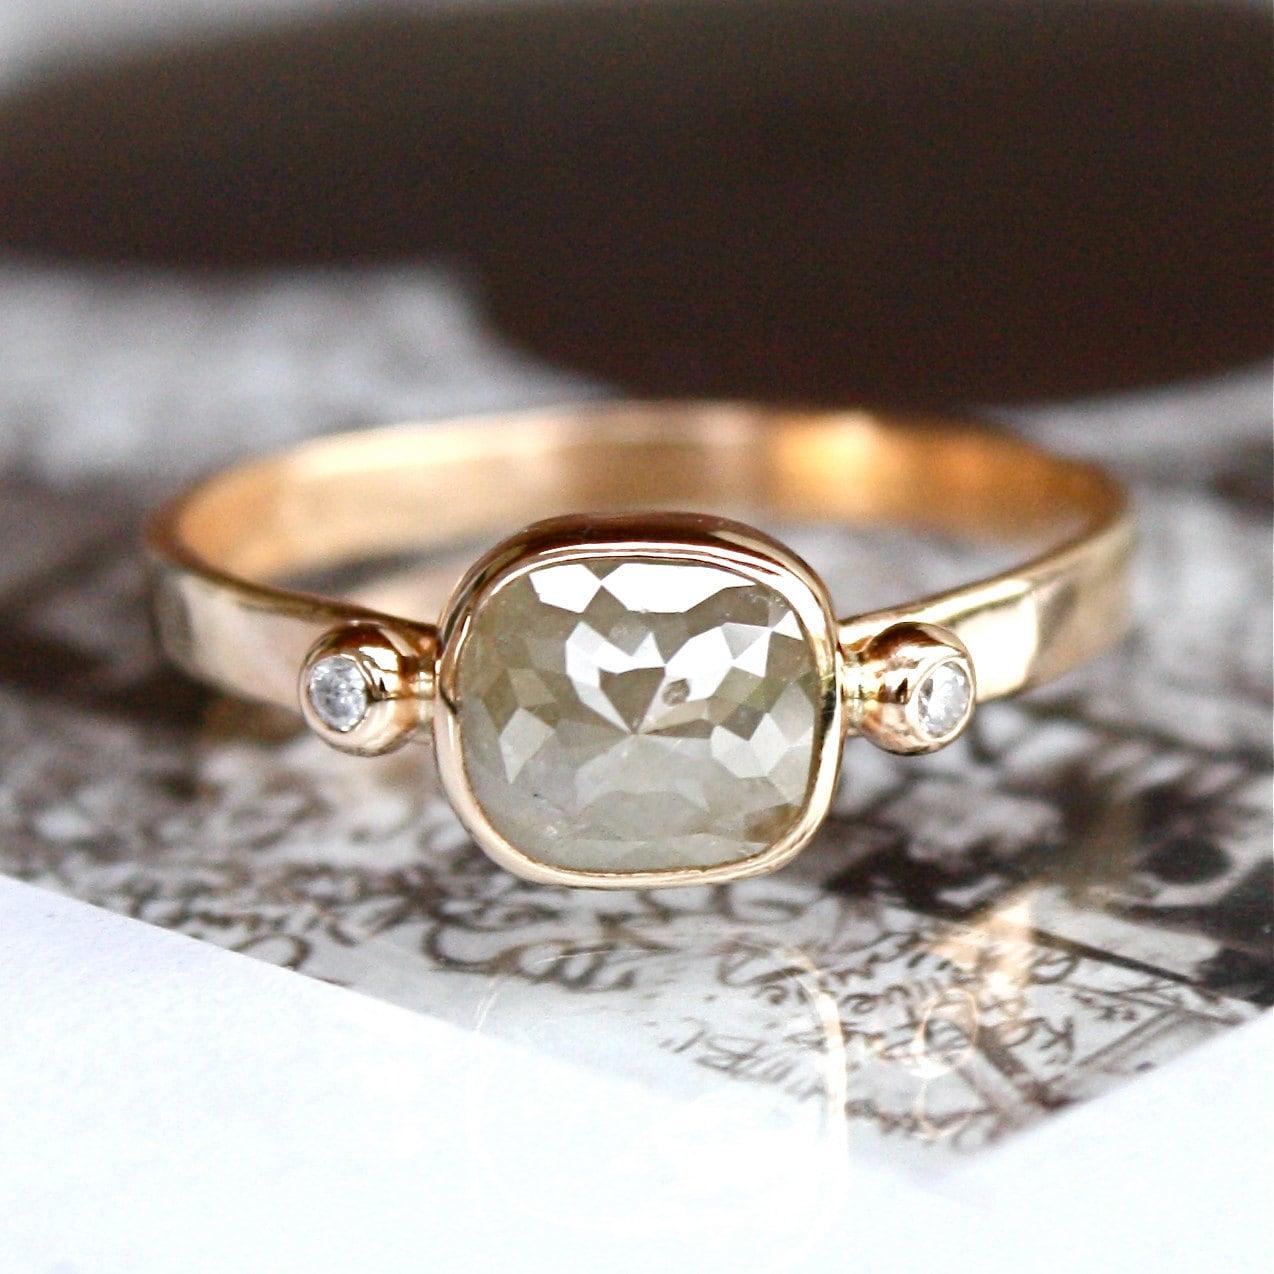 Diamond Ring Rose Cut Diamond Slice In 14k Gold Engagement